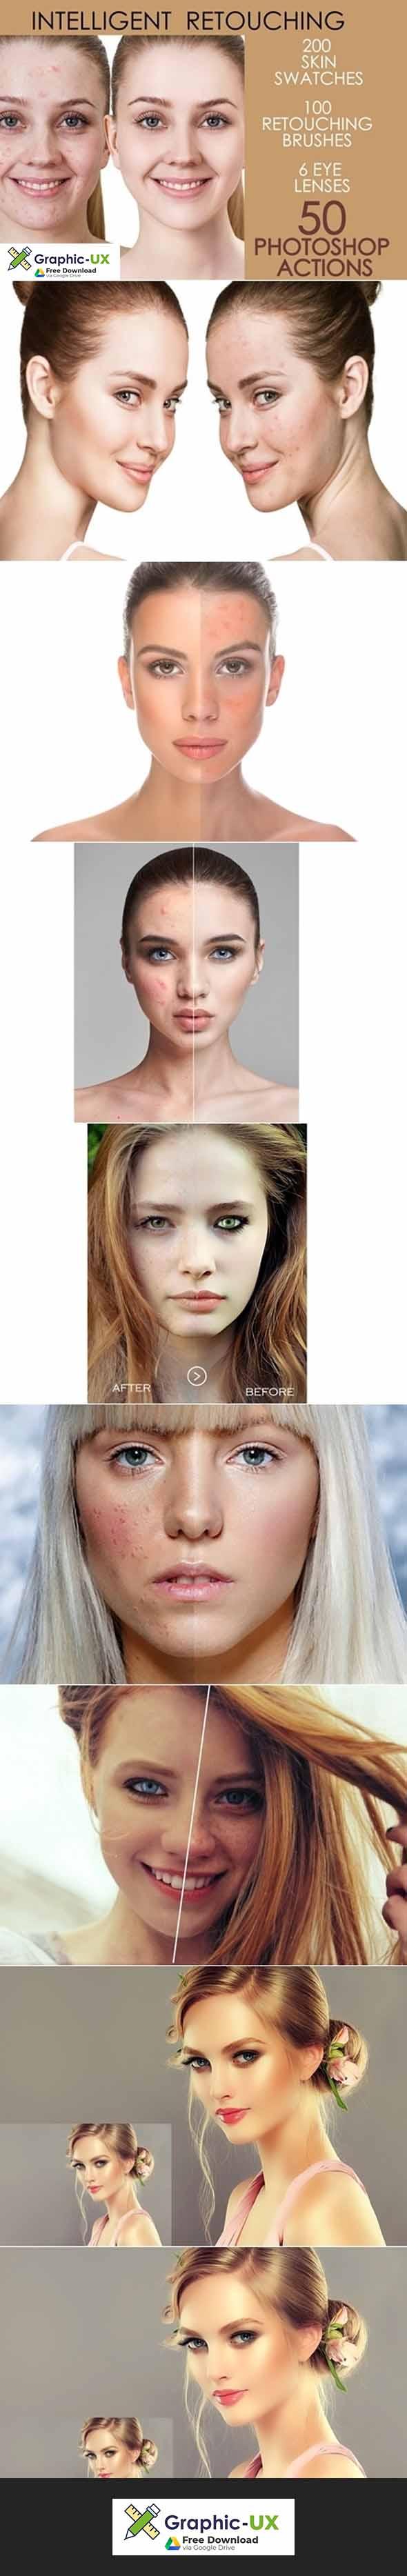 50 Photoshop Actions Retouching Skin